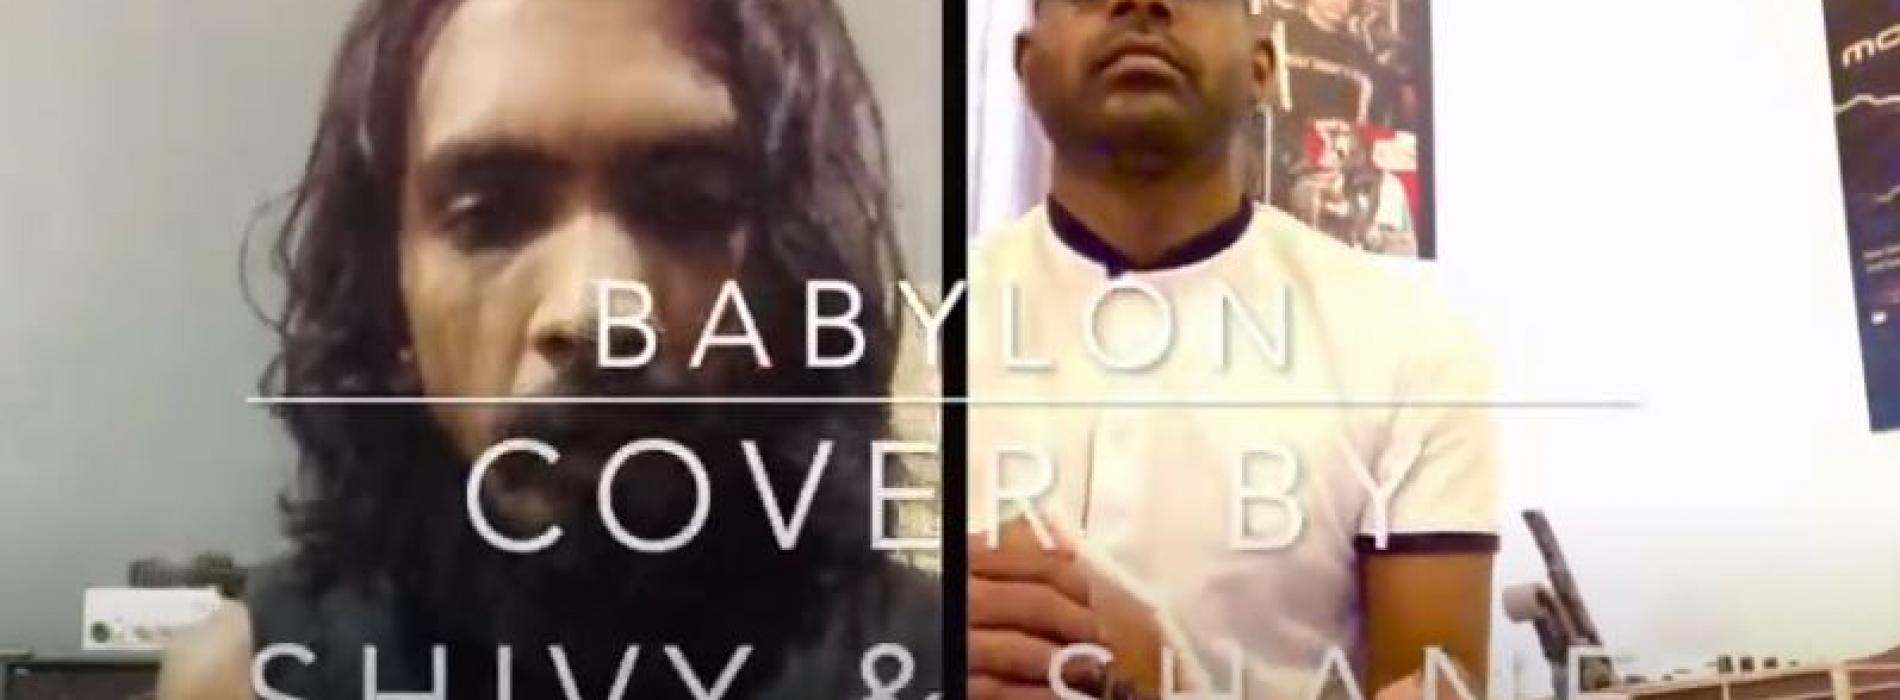 Babylon – David Gray Acoustic Cover By Shivy & Shane